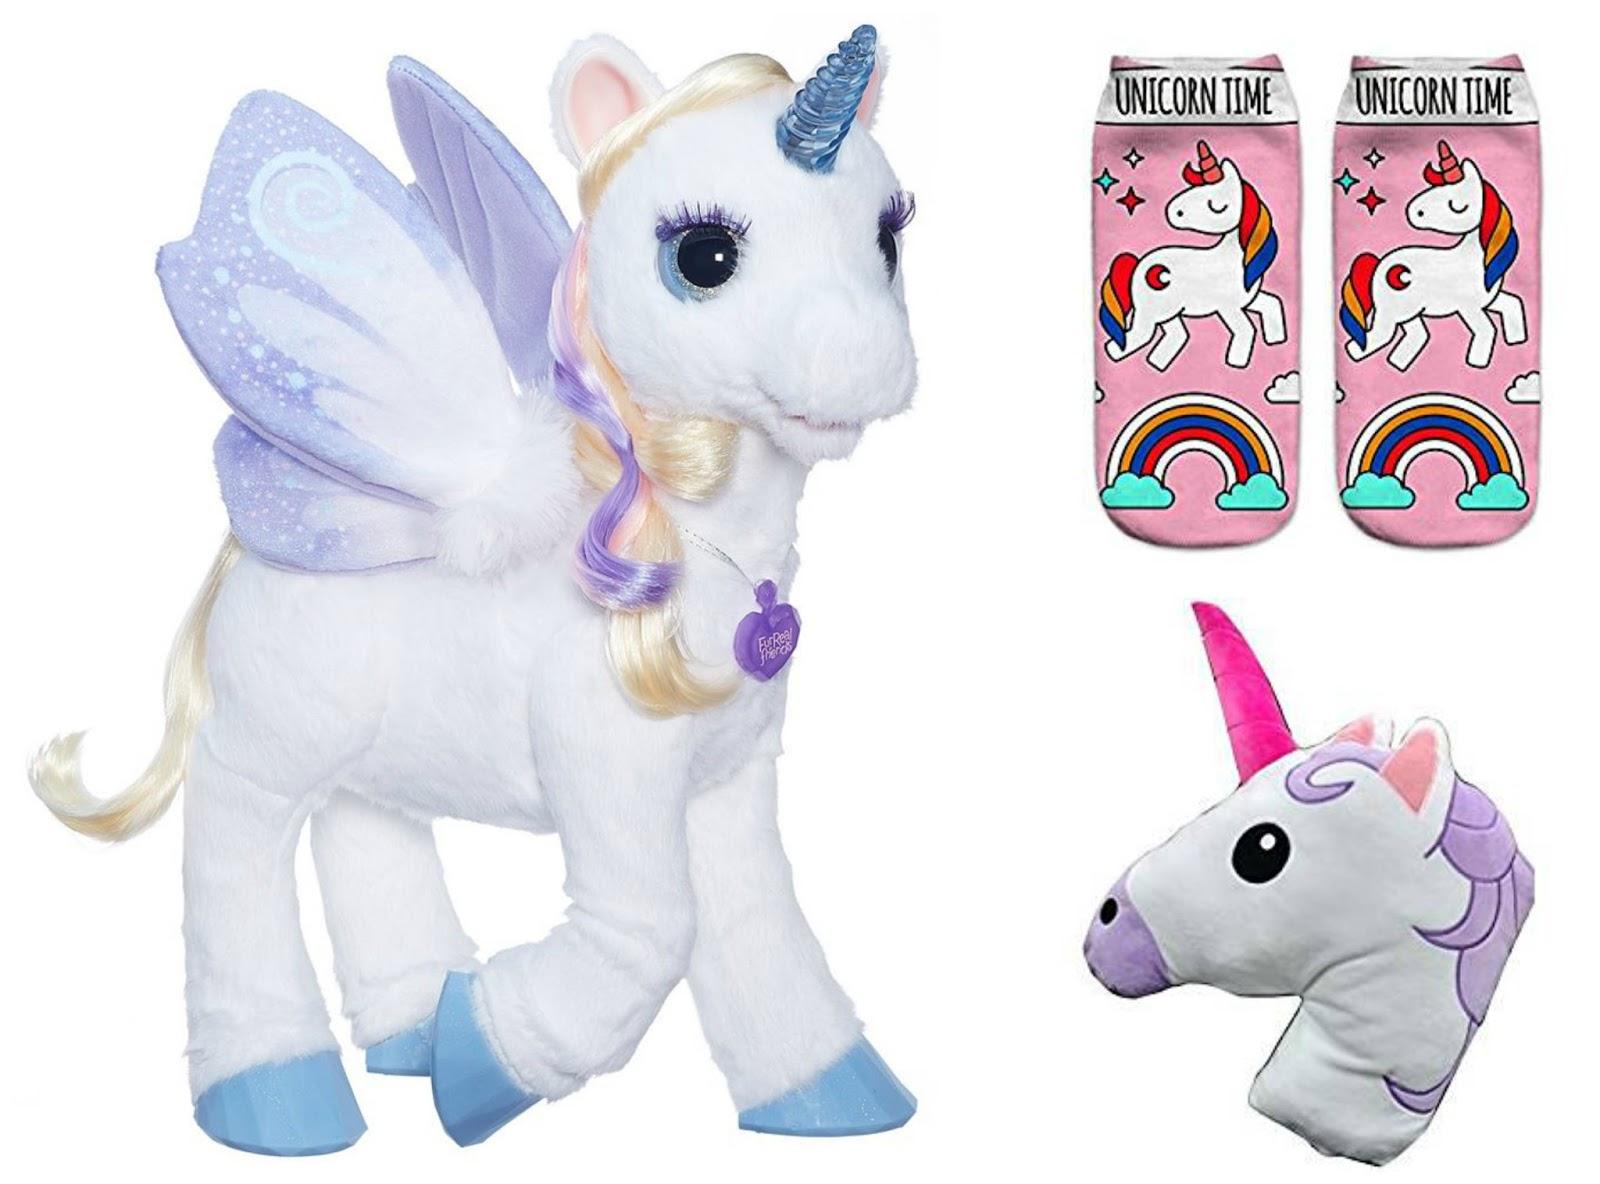 Unicorno Mania Dove Comprare I Gadget Piu Belli Da Mamma A Mamma